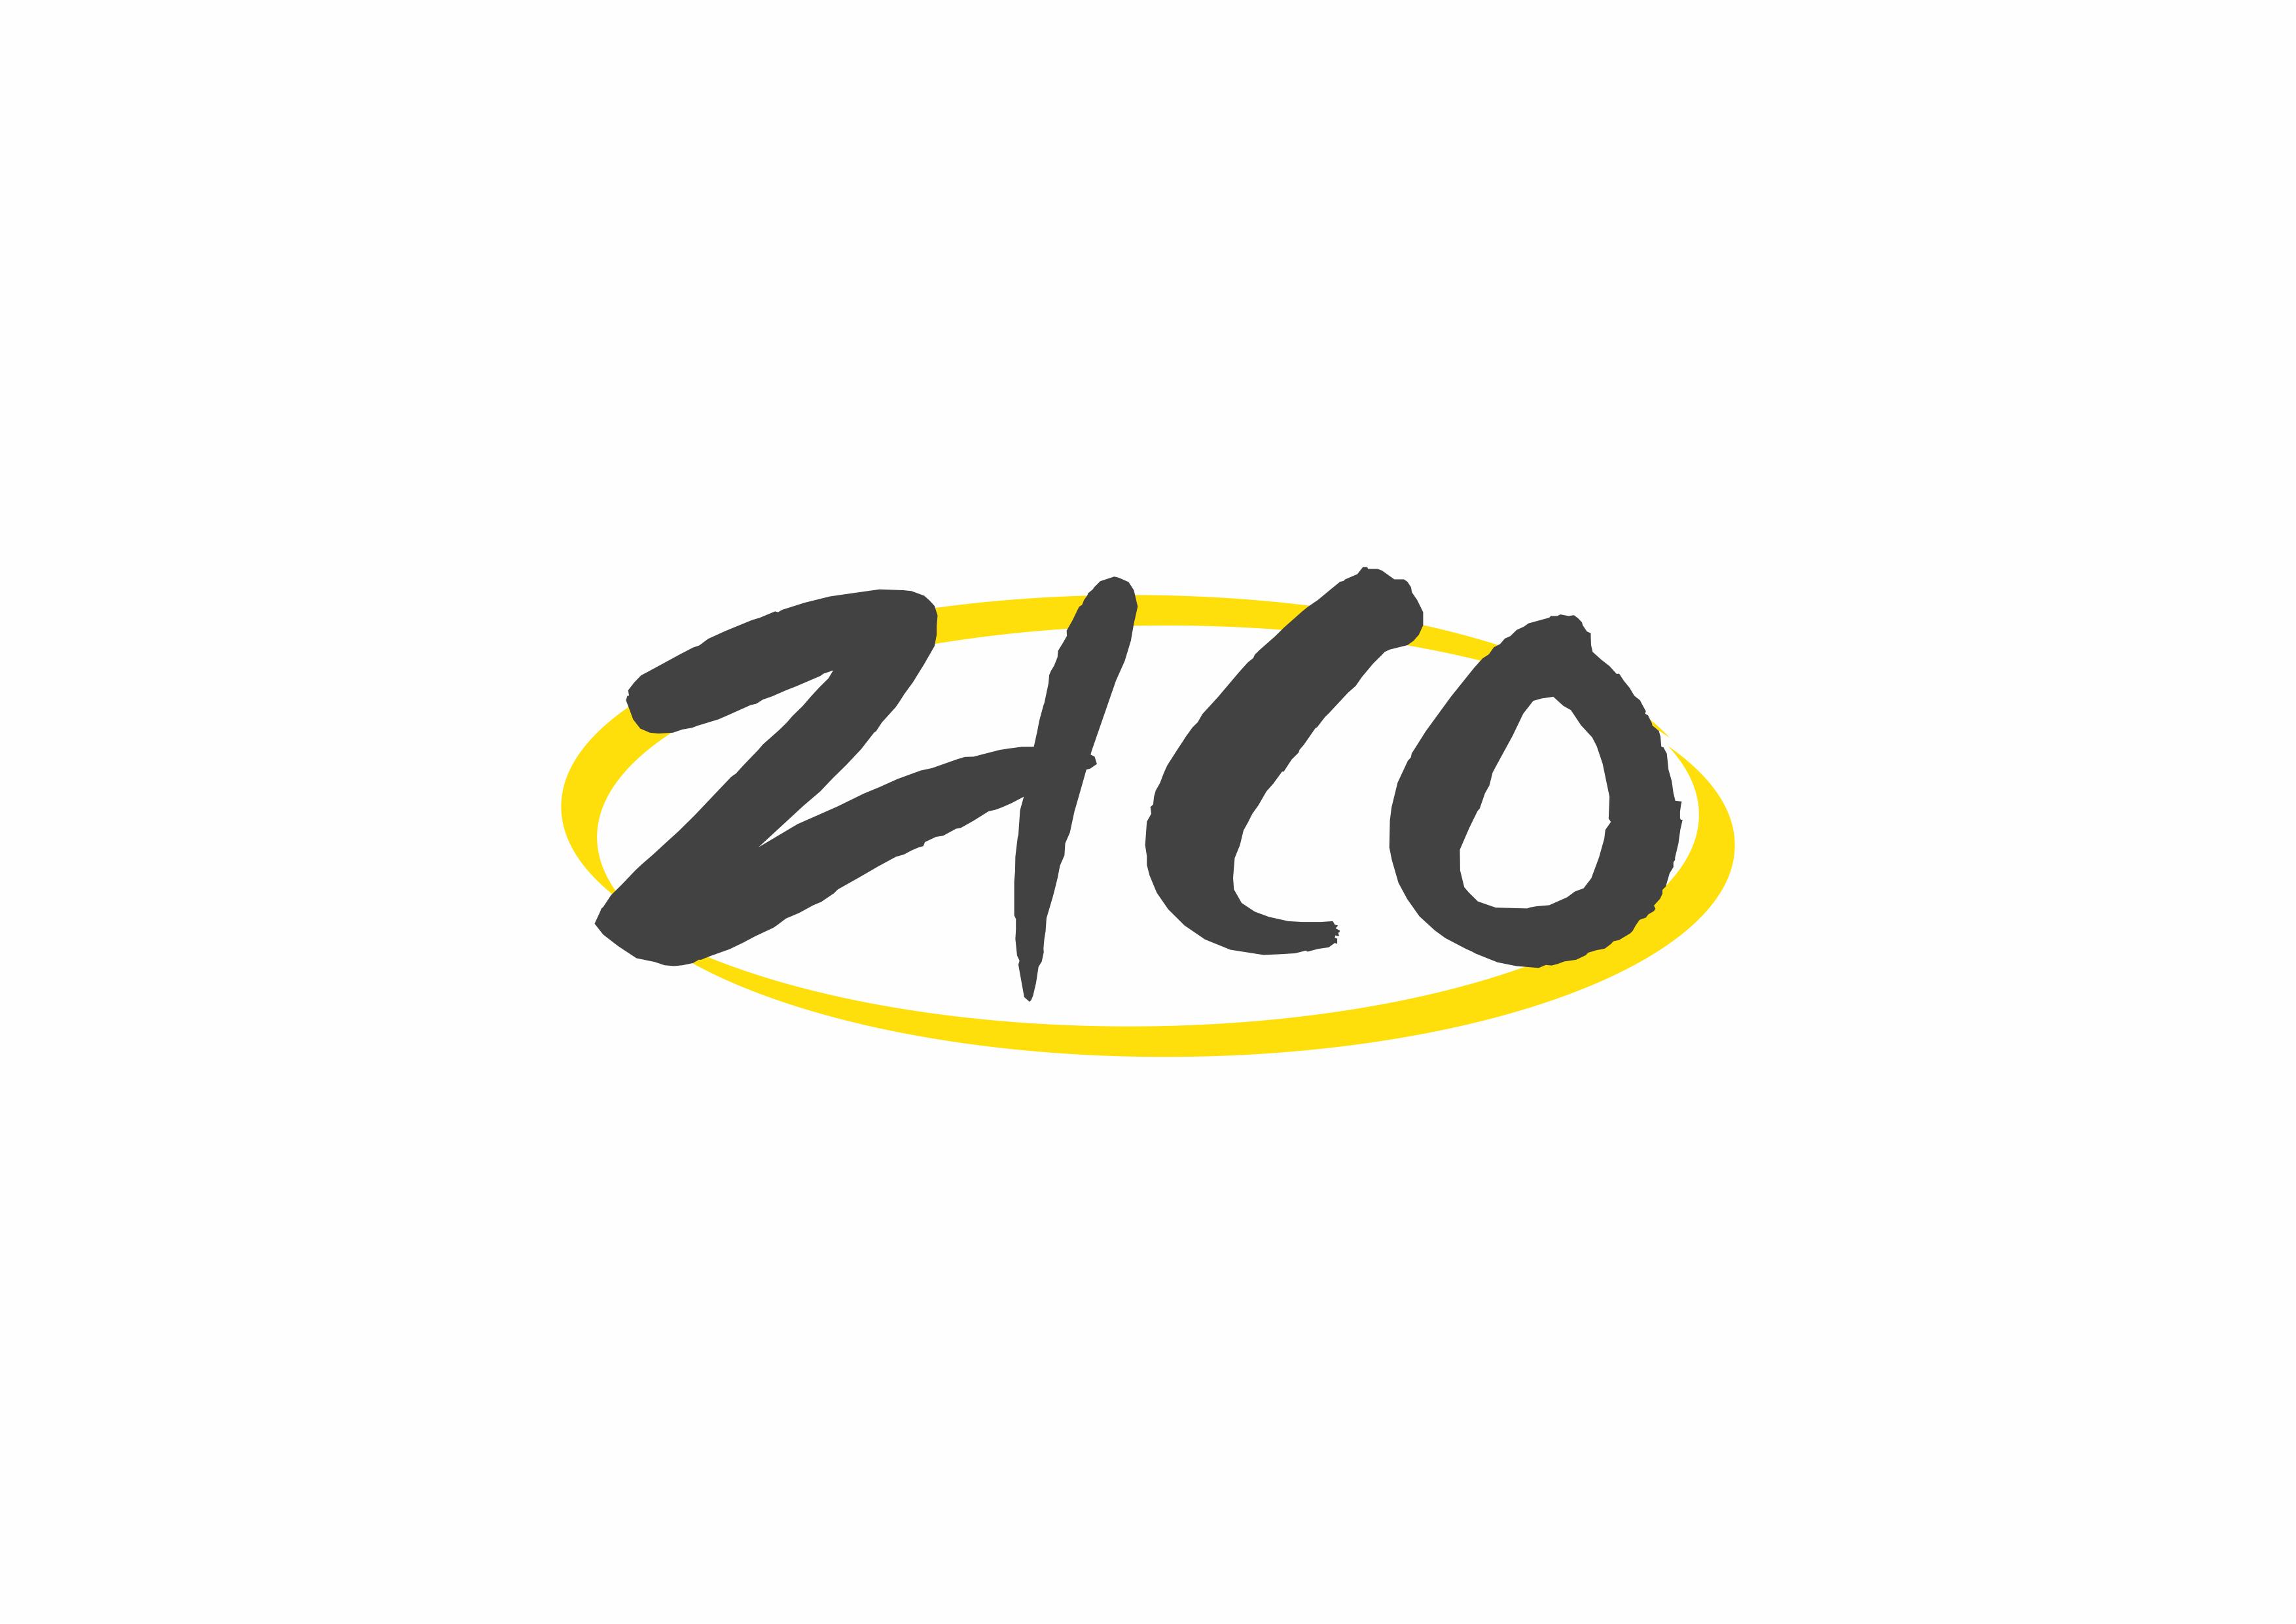 Zico Bike